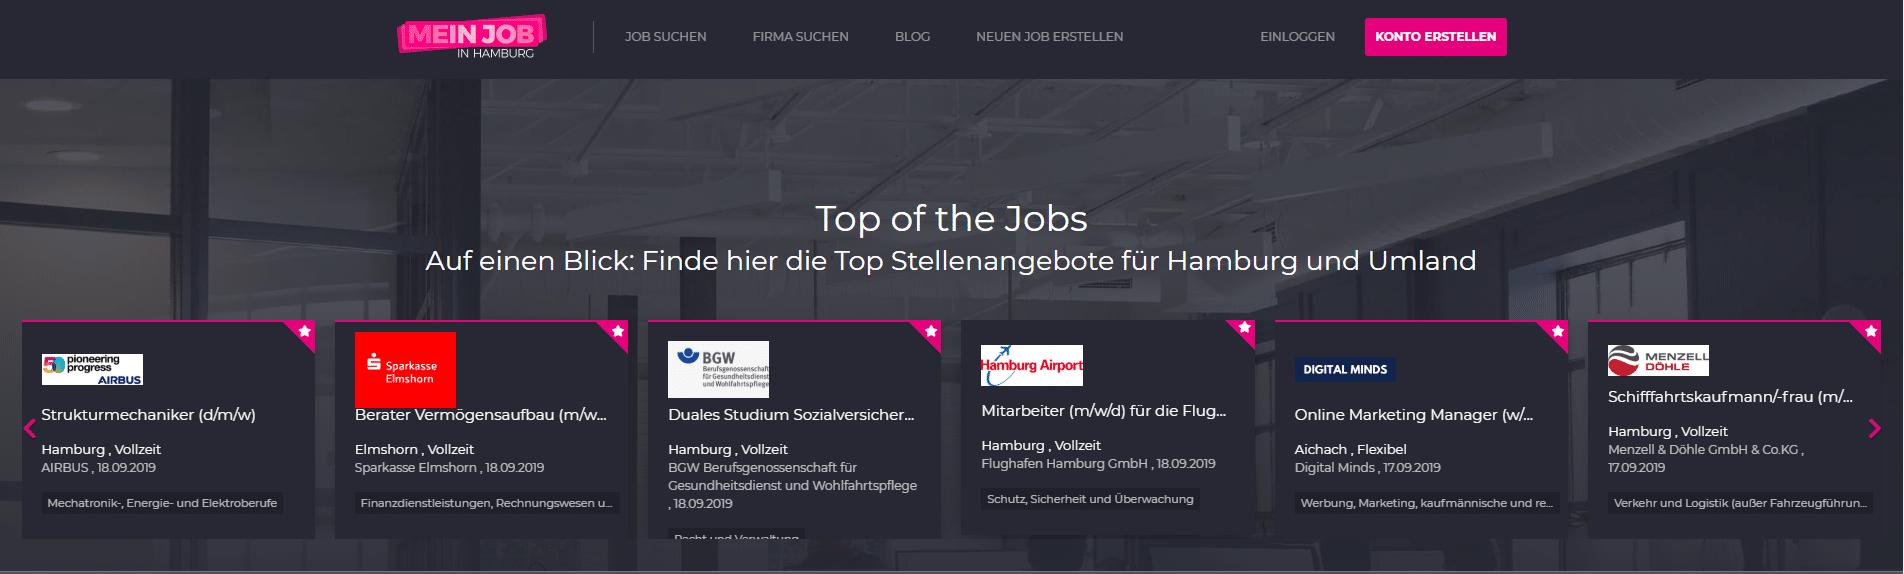 top of the jobs - screenshot